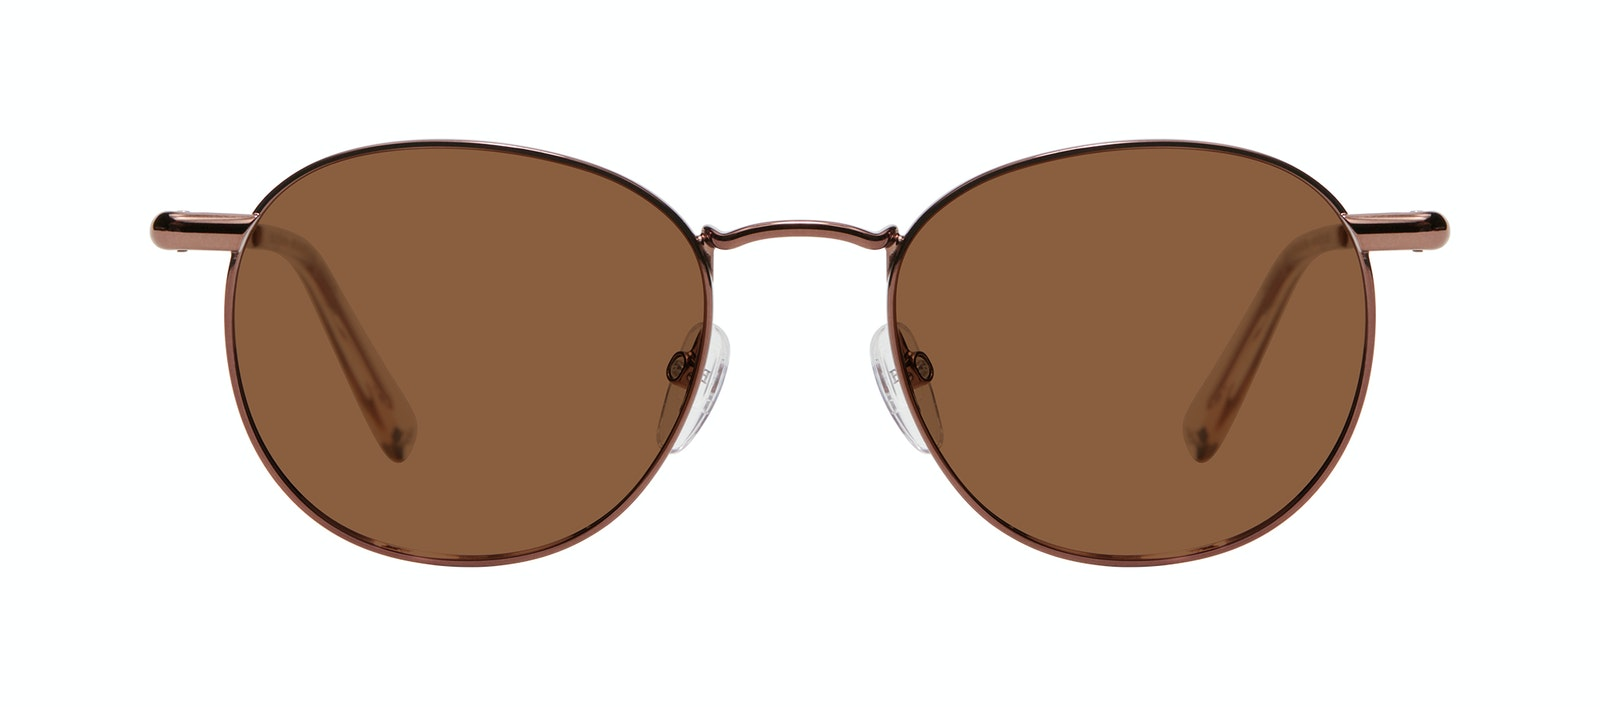 Affordable Fashion Glasses Round Sunglasses Men Women Divine L Copper Front